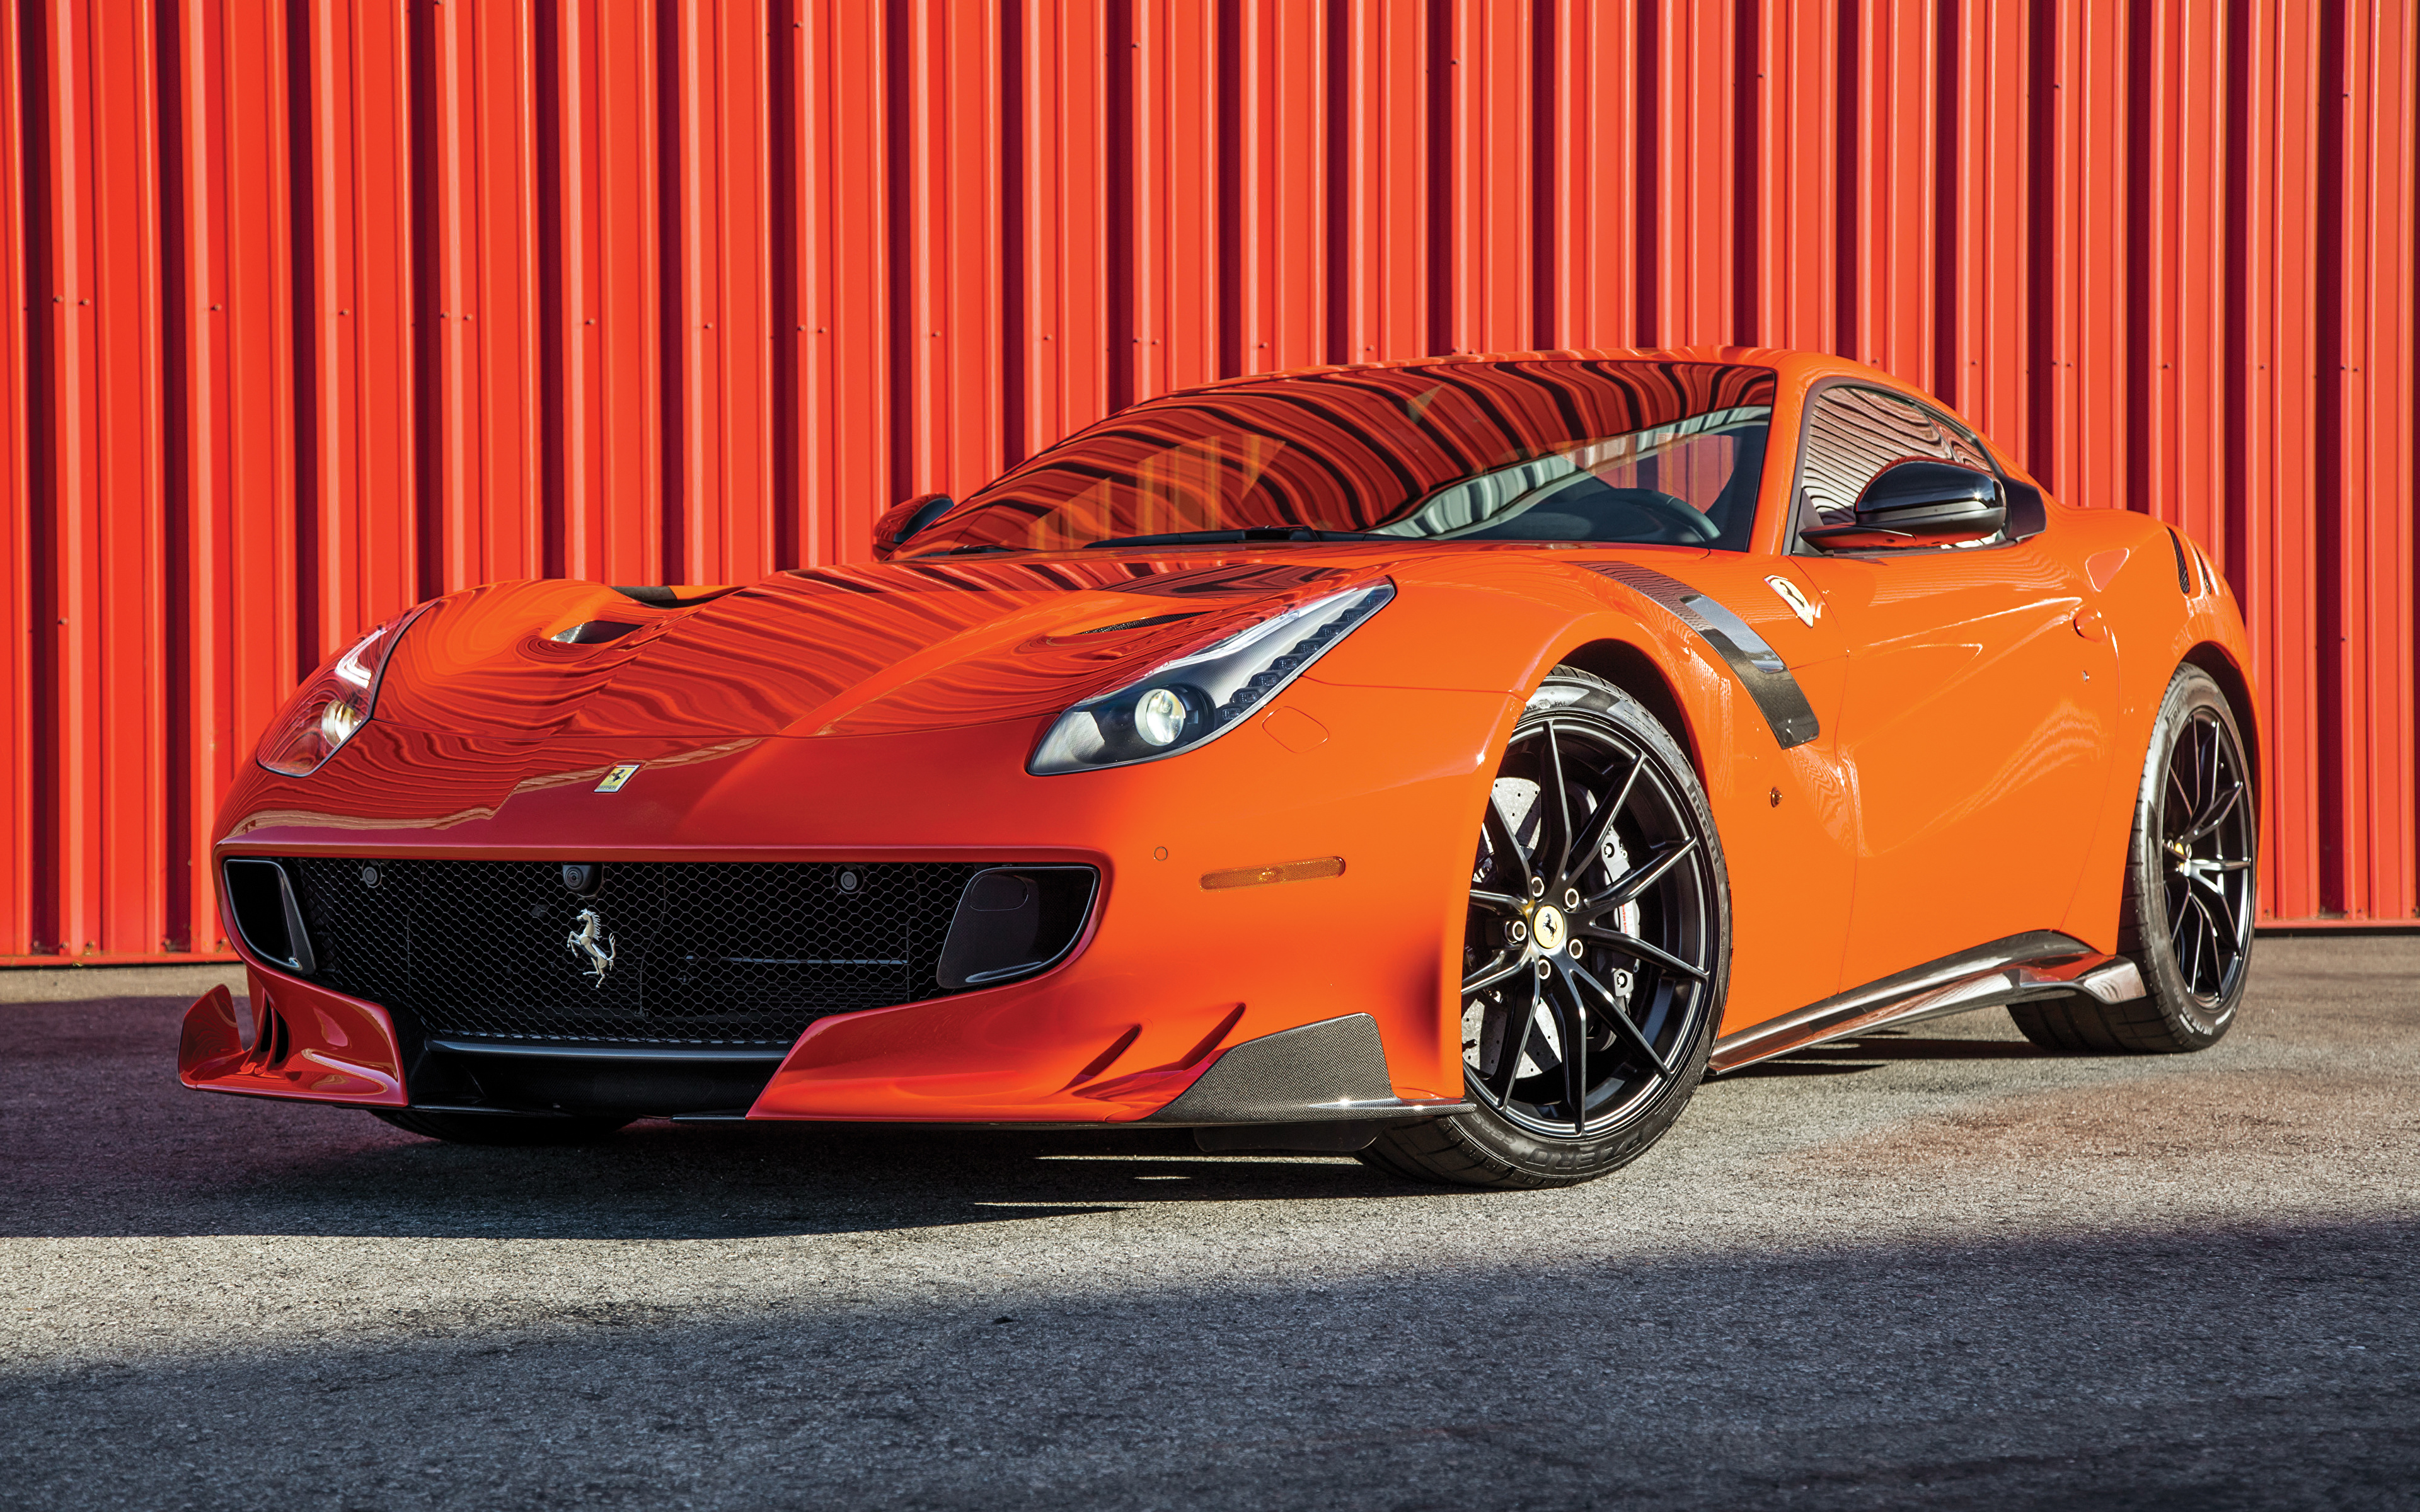 Ferrari F12 Berlinetta спорткар  № 553349 загрузить